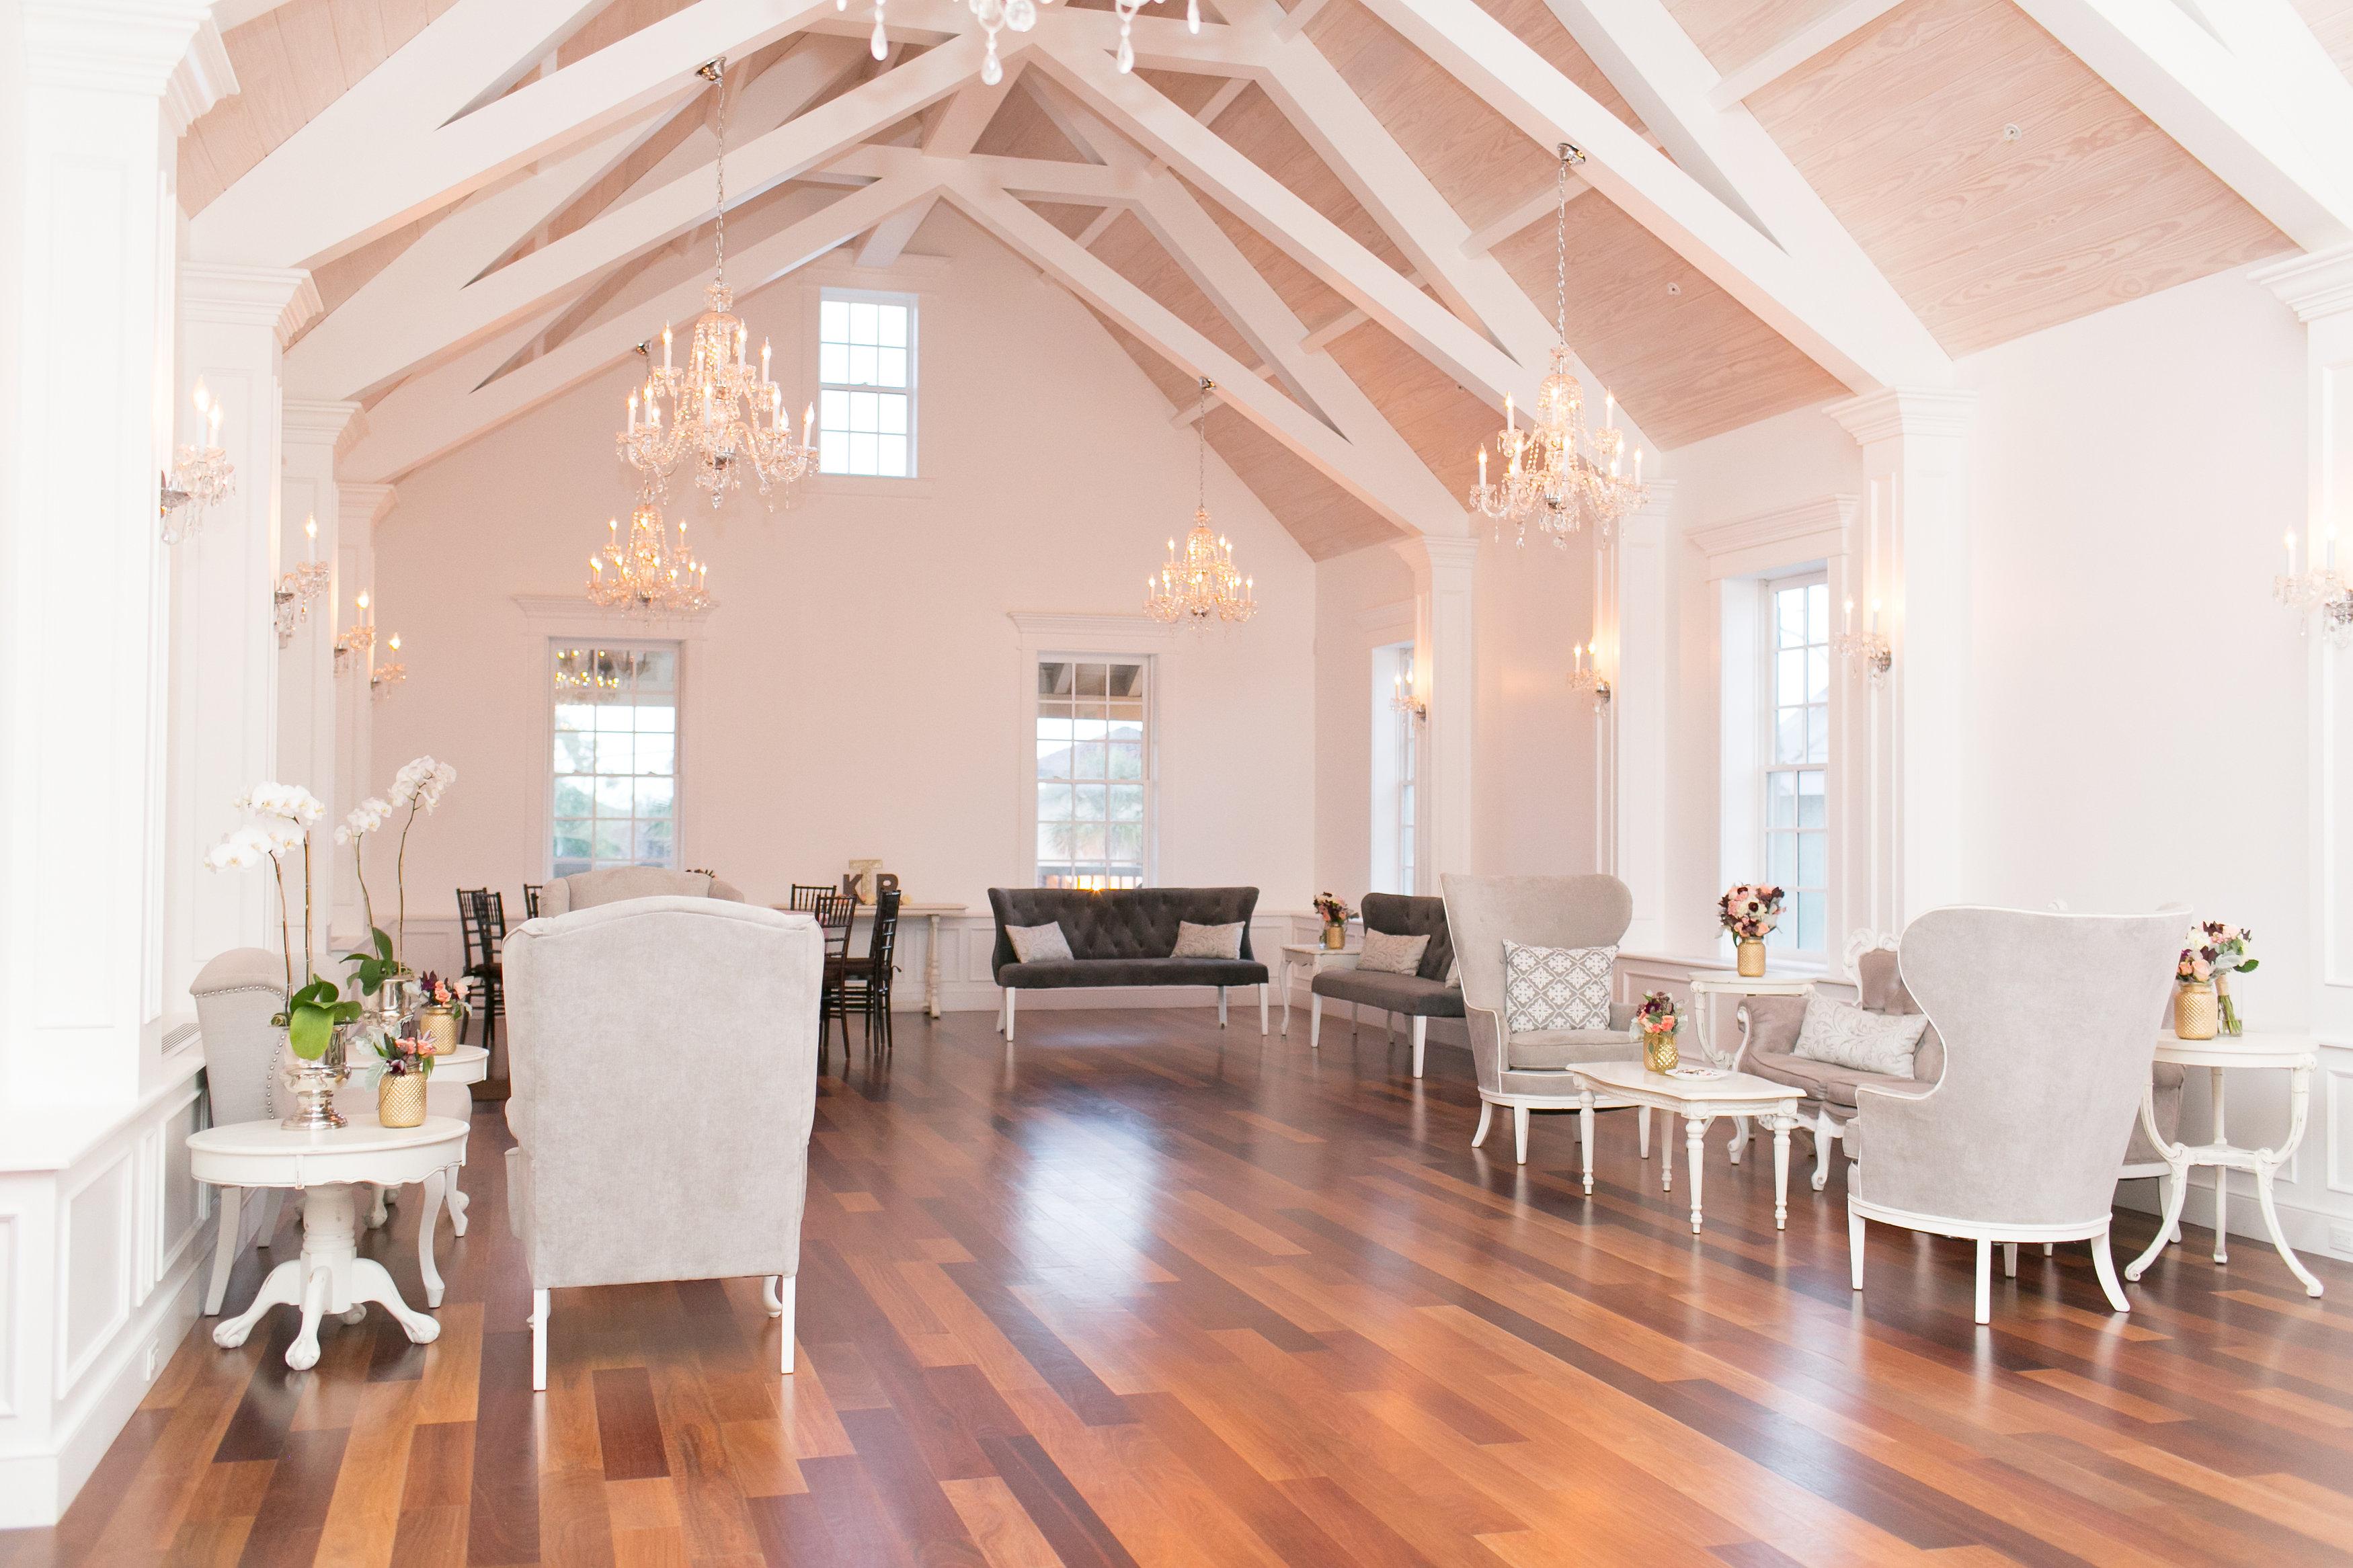 The Villa Blanca Reception on second floor after ceremony